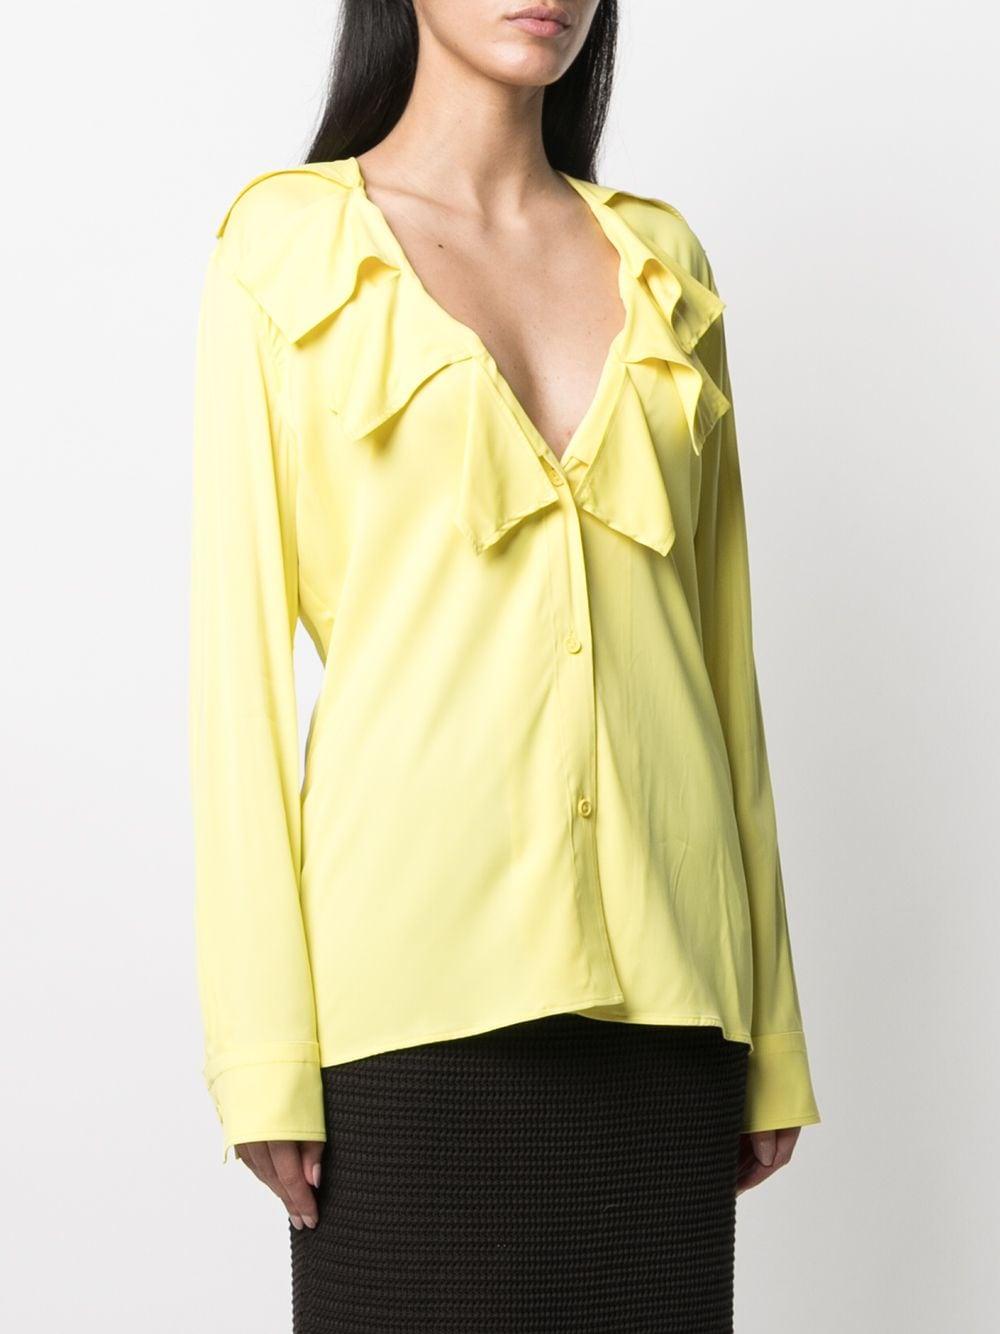 bright yellow viscose shirt featuring ribbon collar  BOTTEGA VENETA |  | 646584-V01N07219